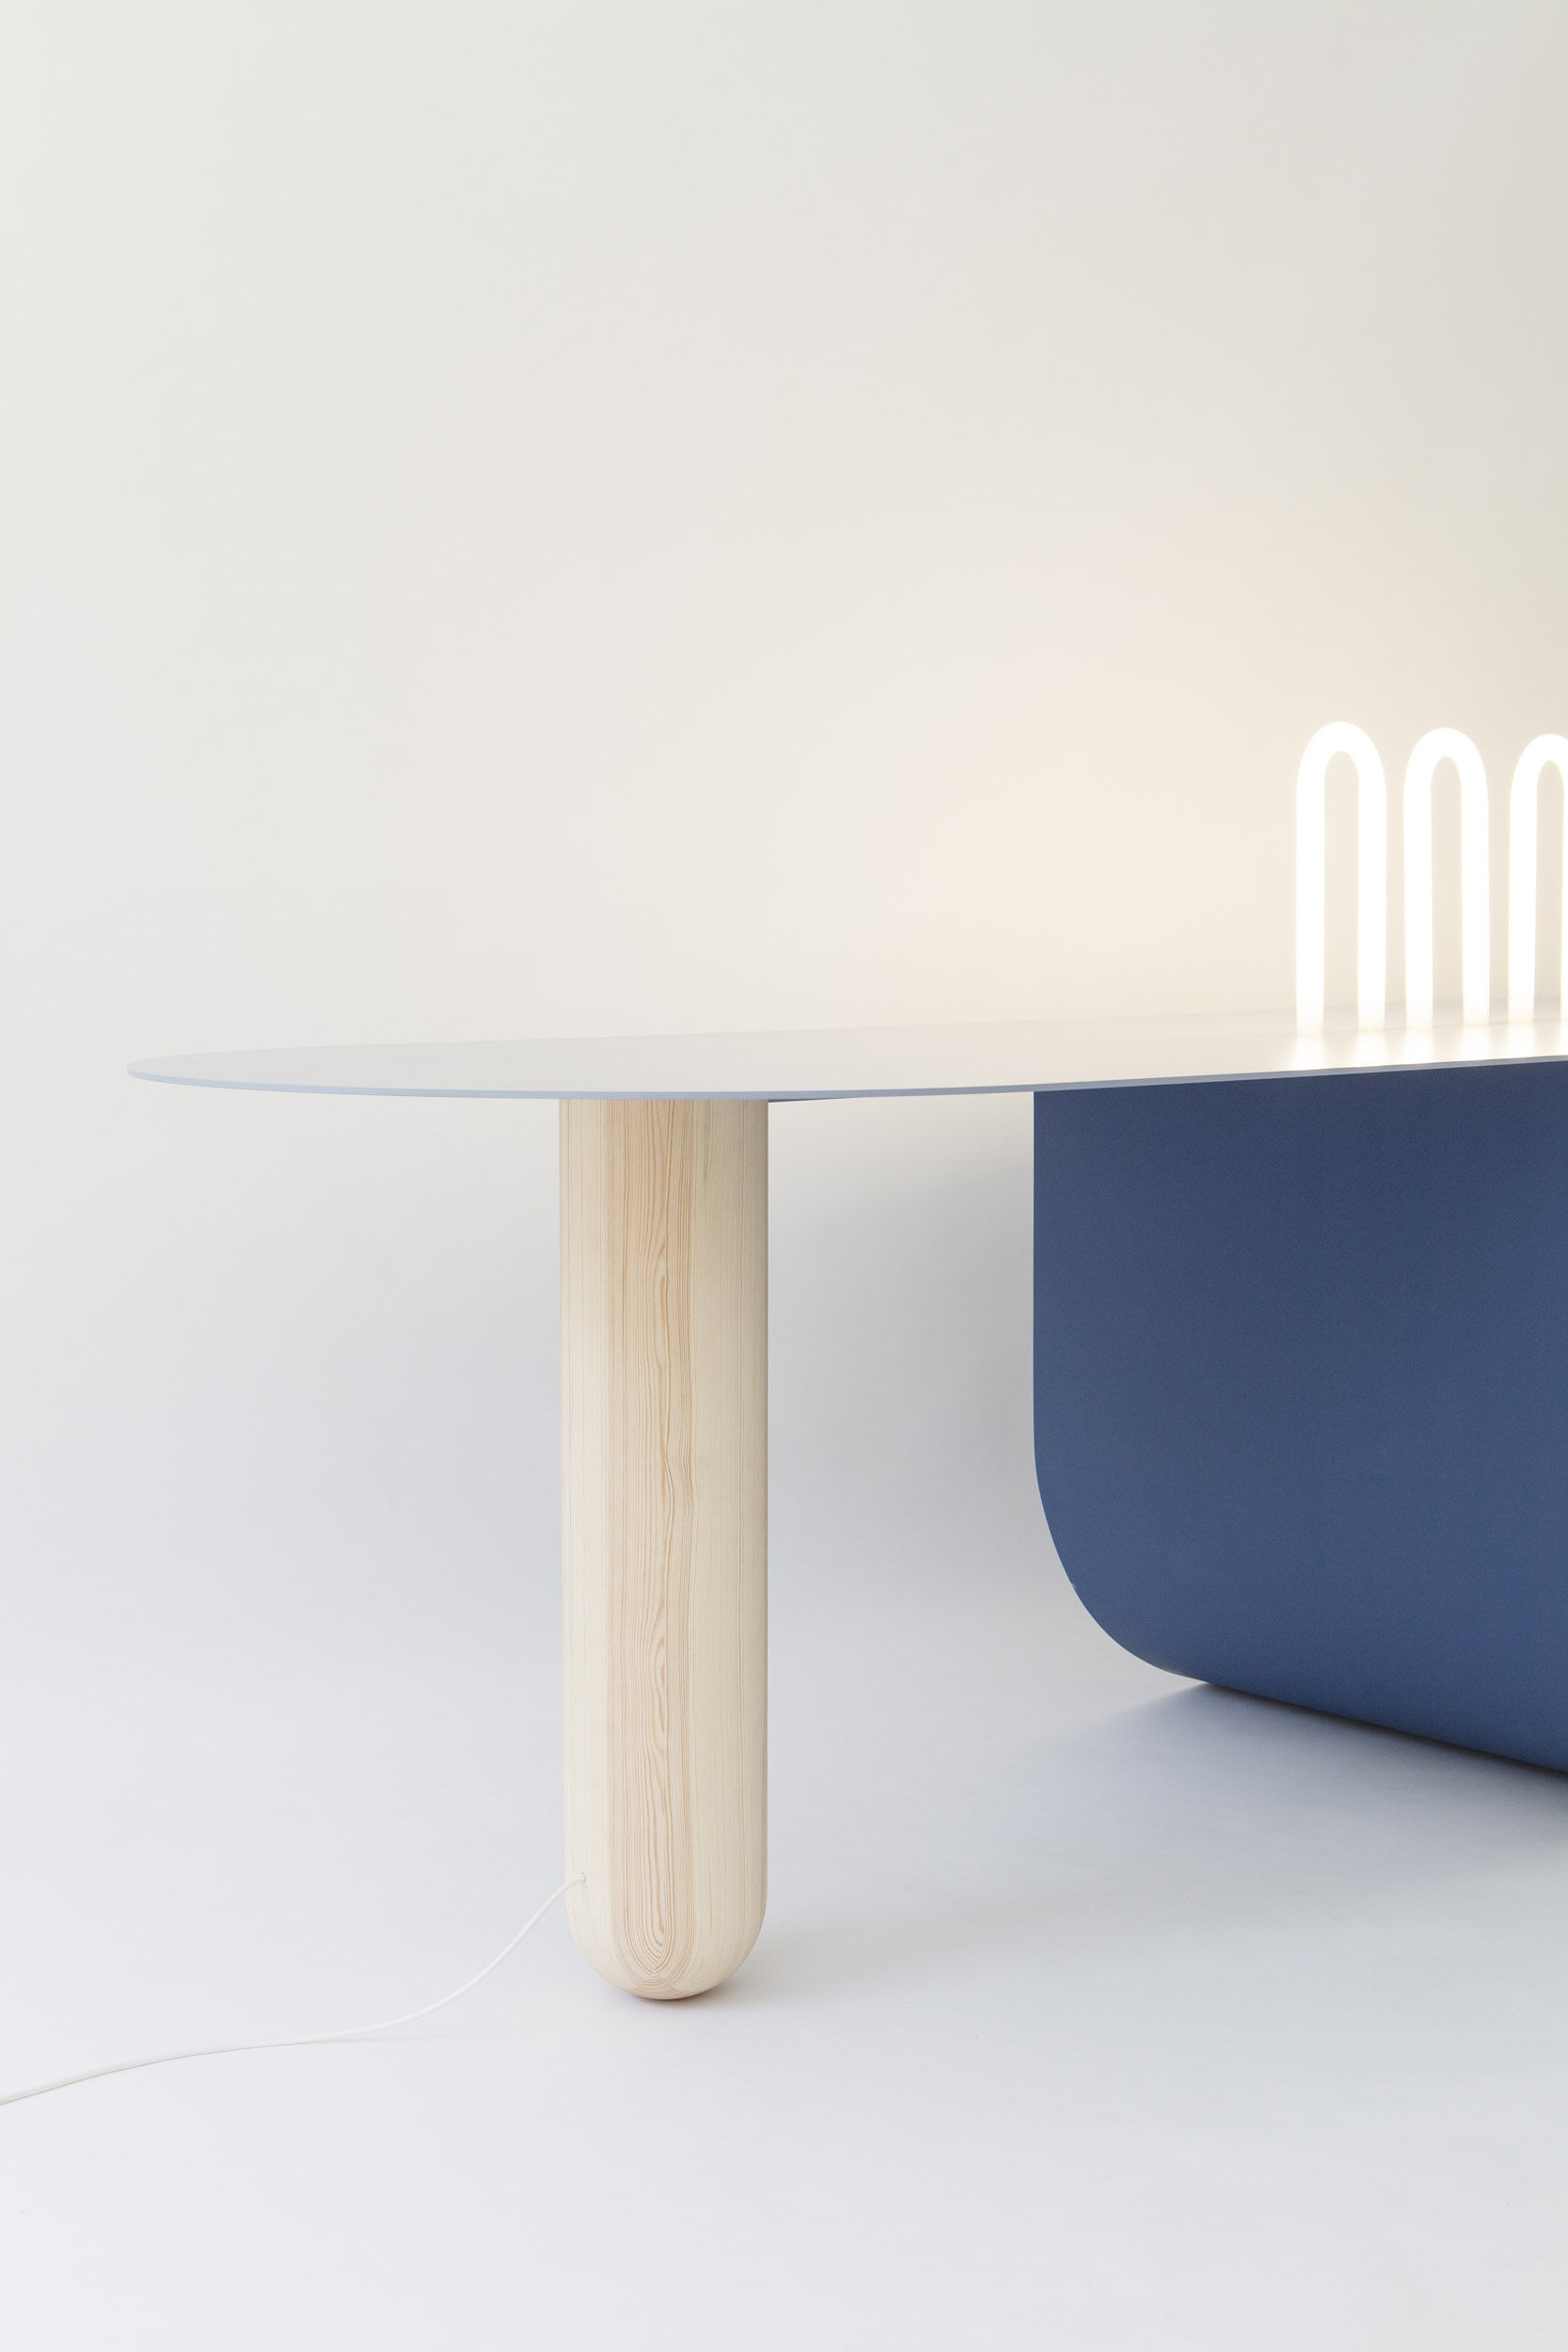 TABLE PONT,  WOOD, ALUMINIUM, GLASS  220 x 80 x 73cm